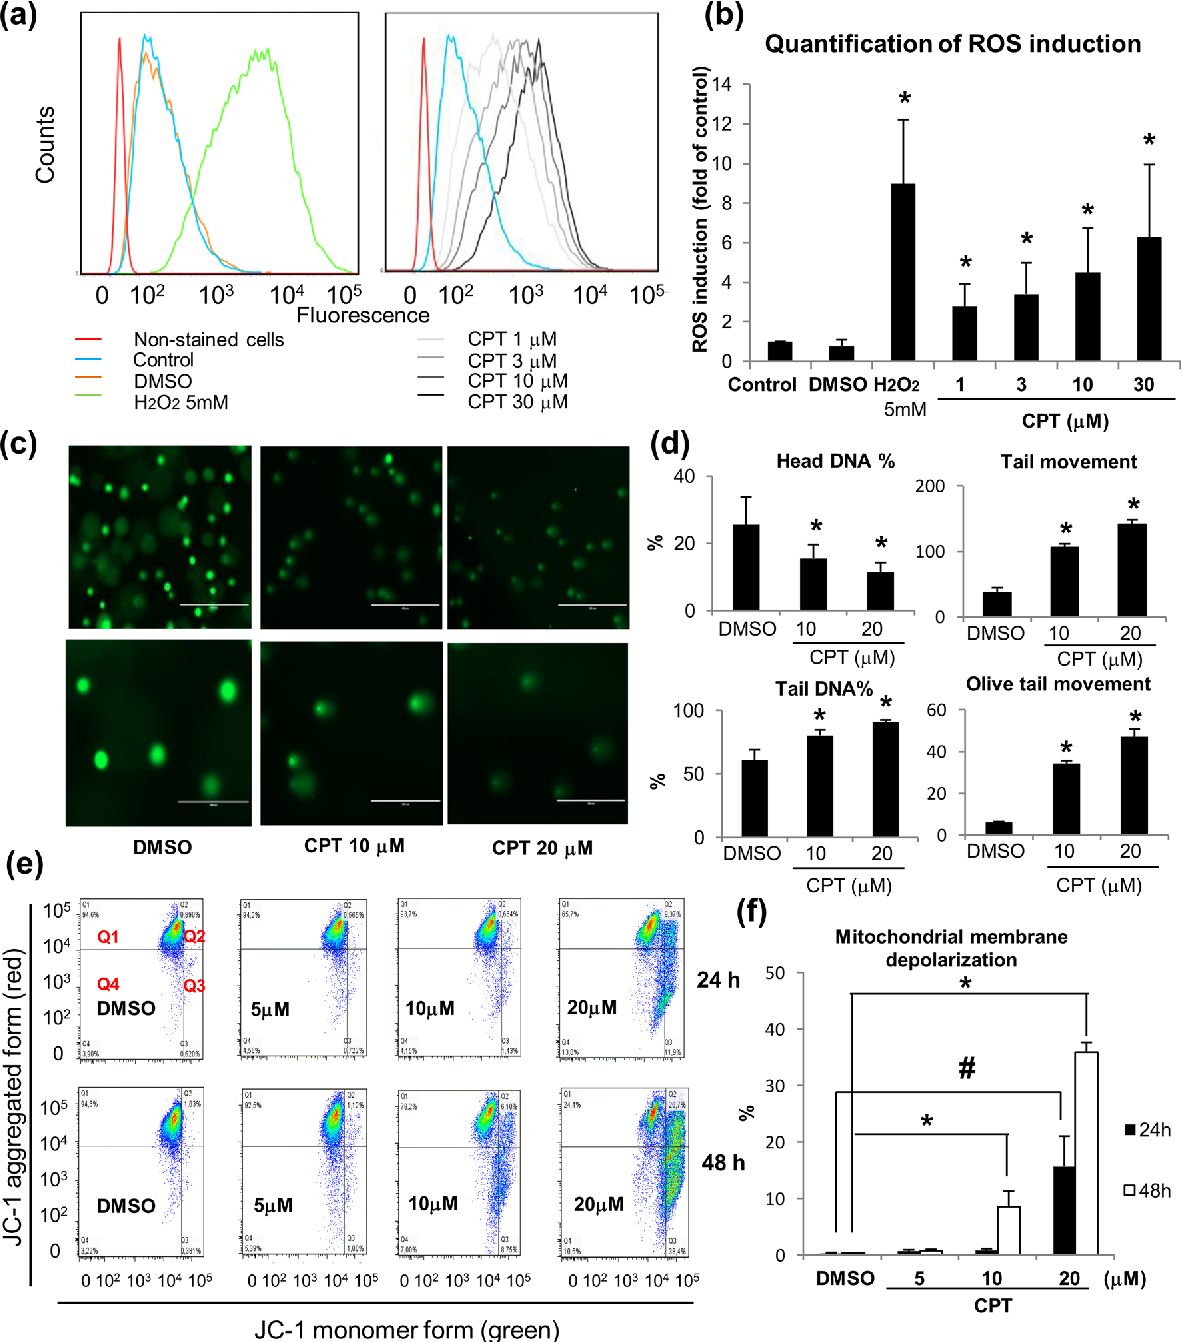 Anticancer activity of cryptotanshinone on acute lymphoblastic